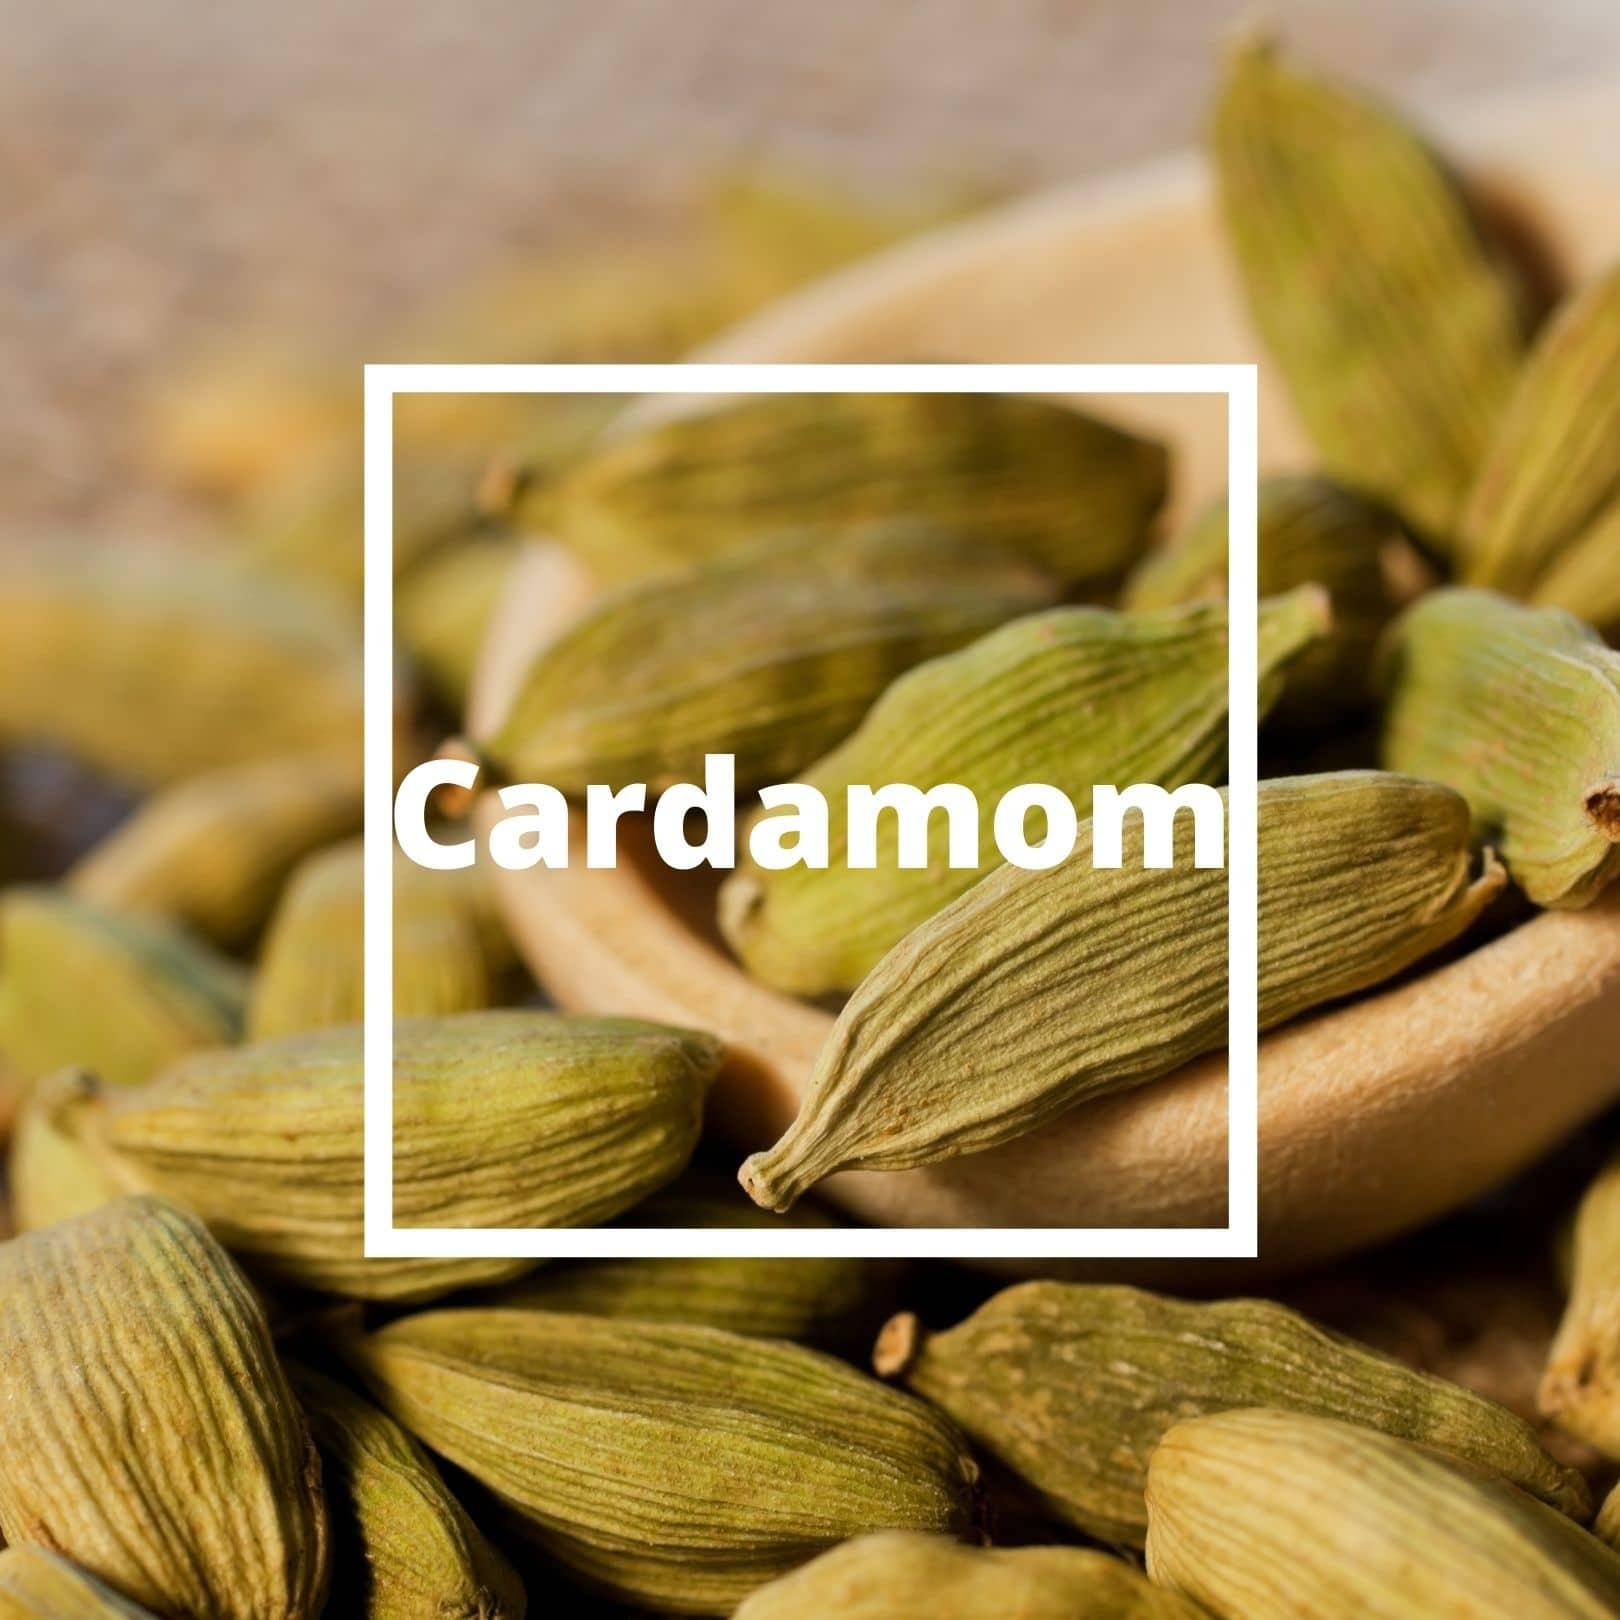 L'ATELIERO - Cardamom - Irresistible Man